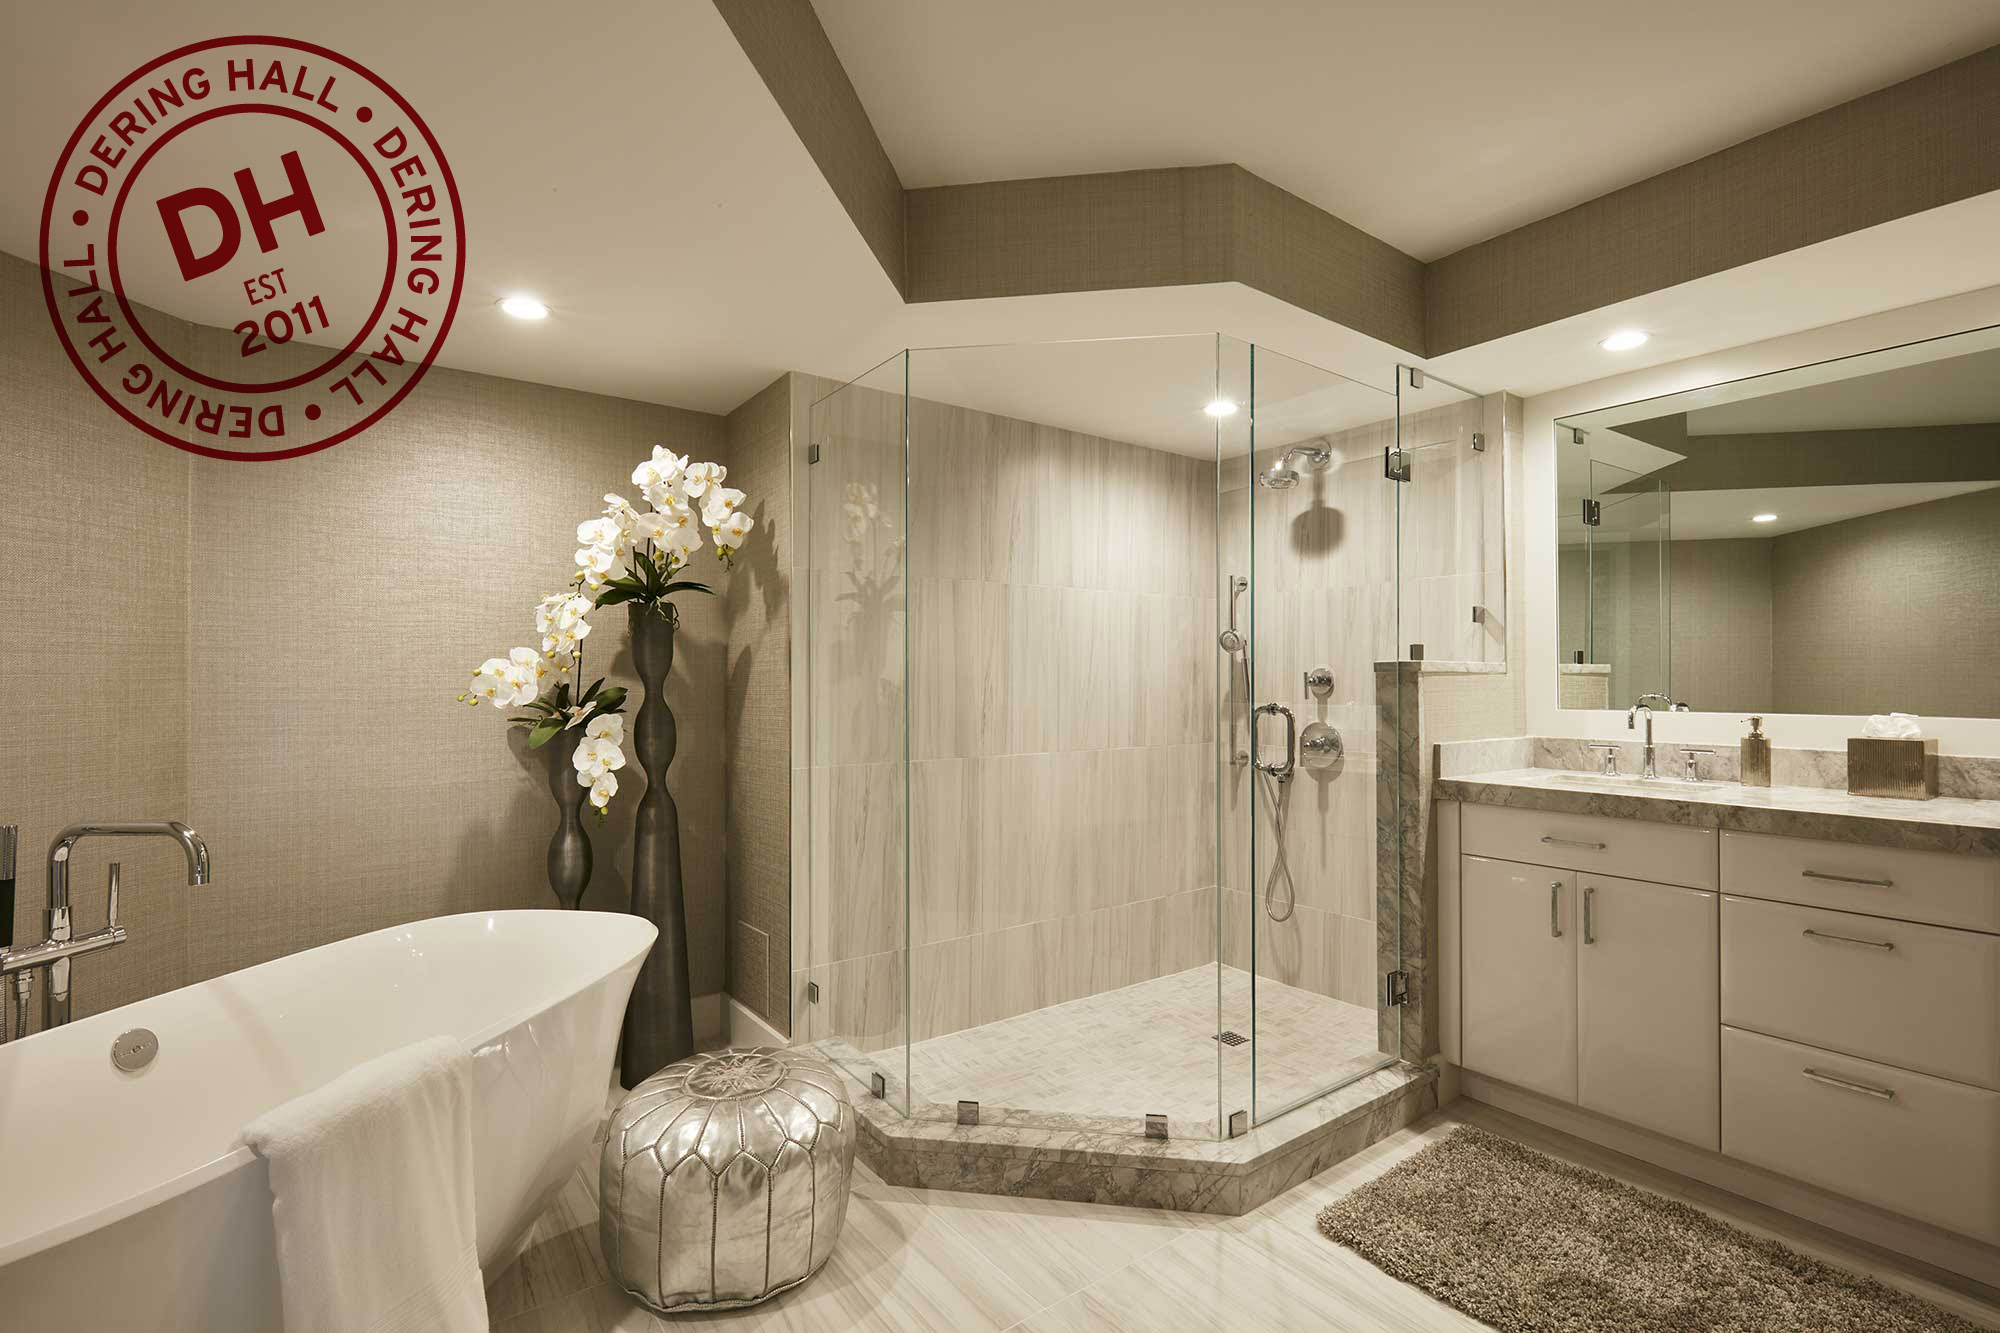 Wells & Fox - Interior Designer - Dering Hall